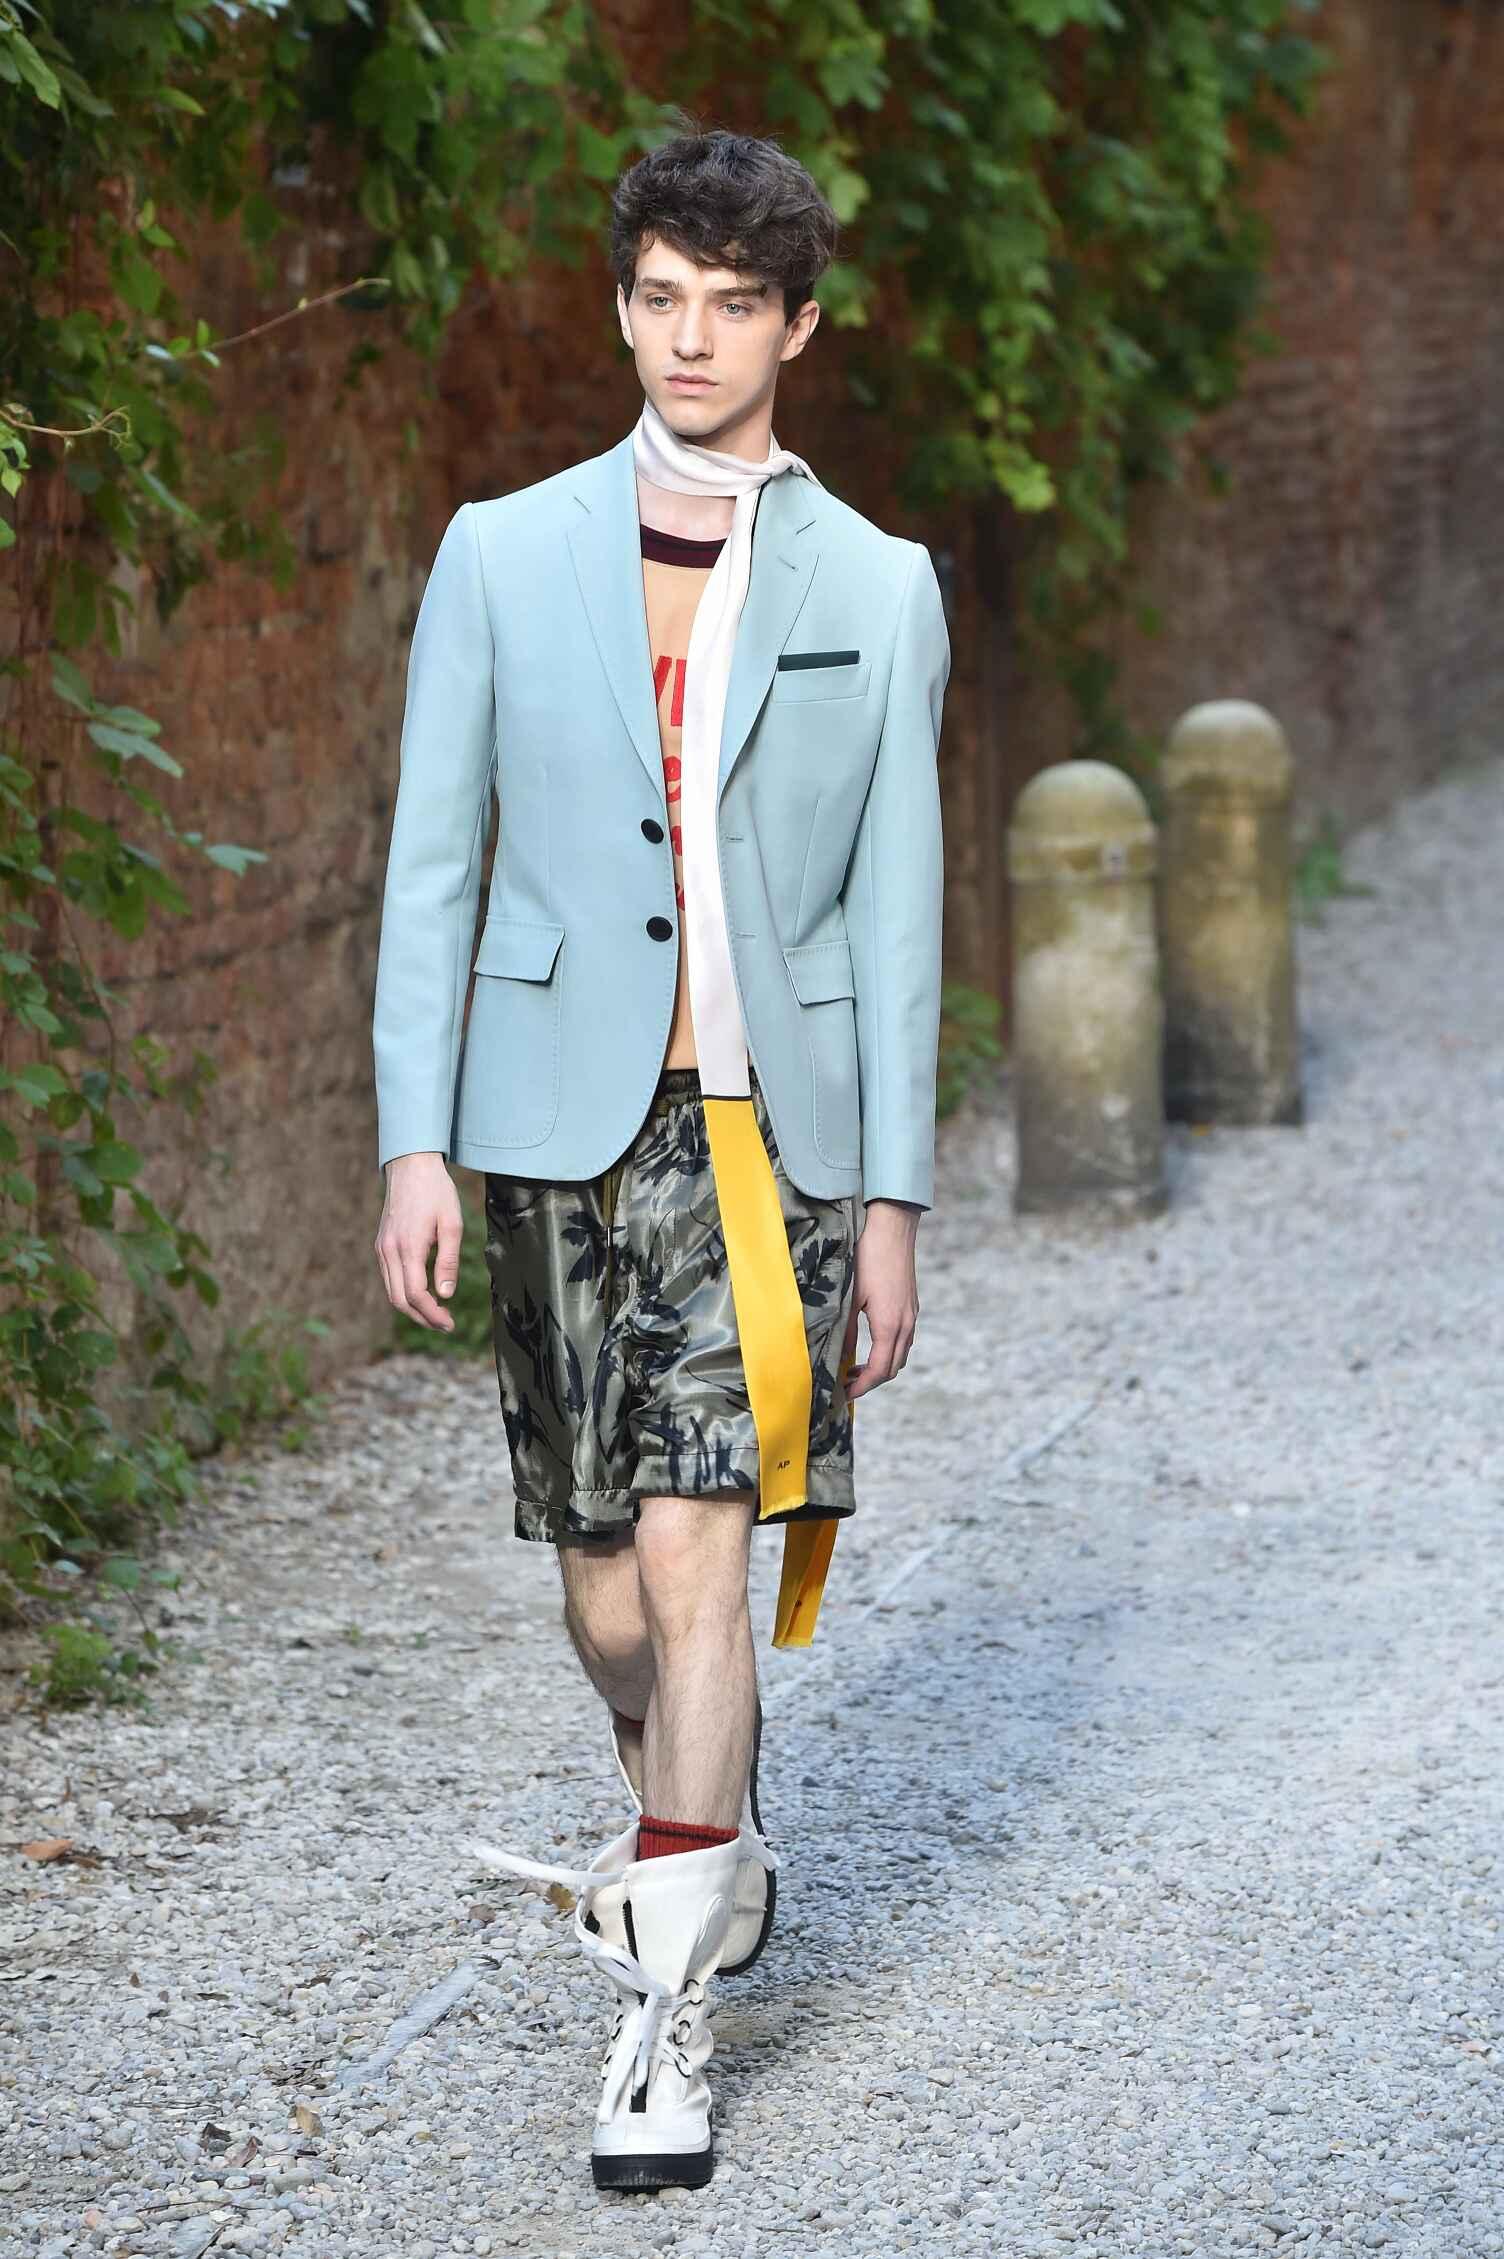 2016 Fashion Man Model Andrea Pompilio Collection Catwalk